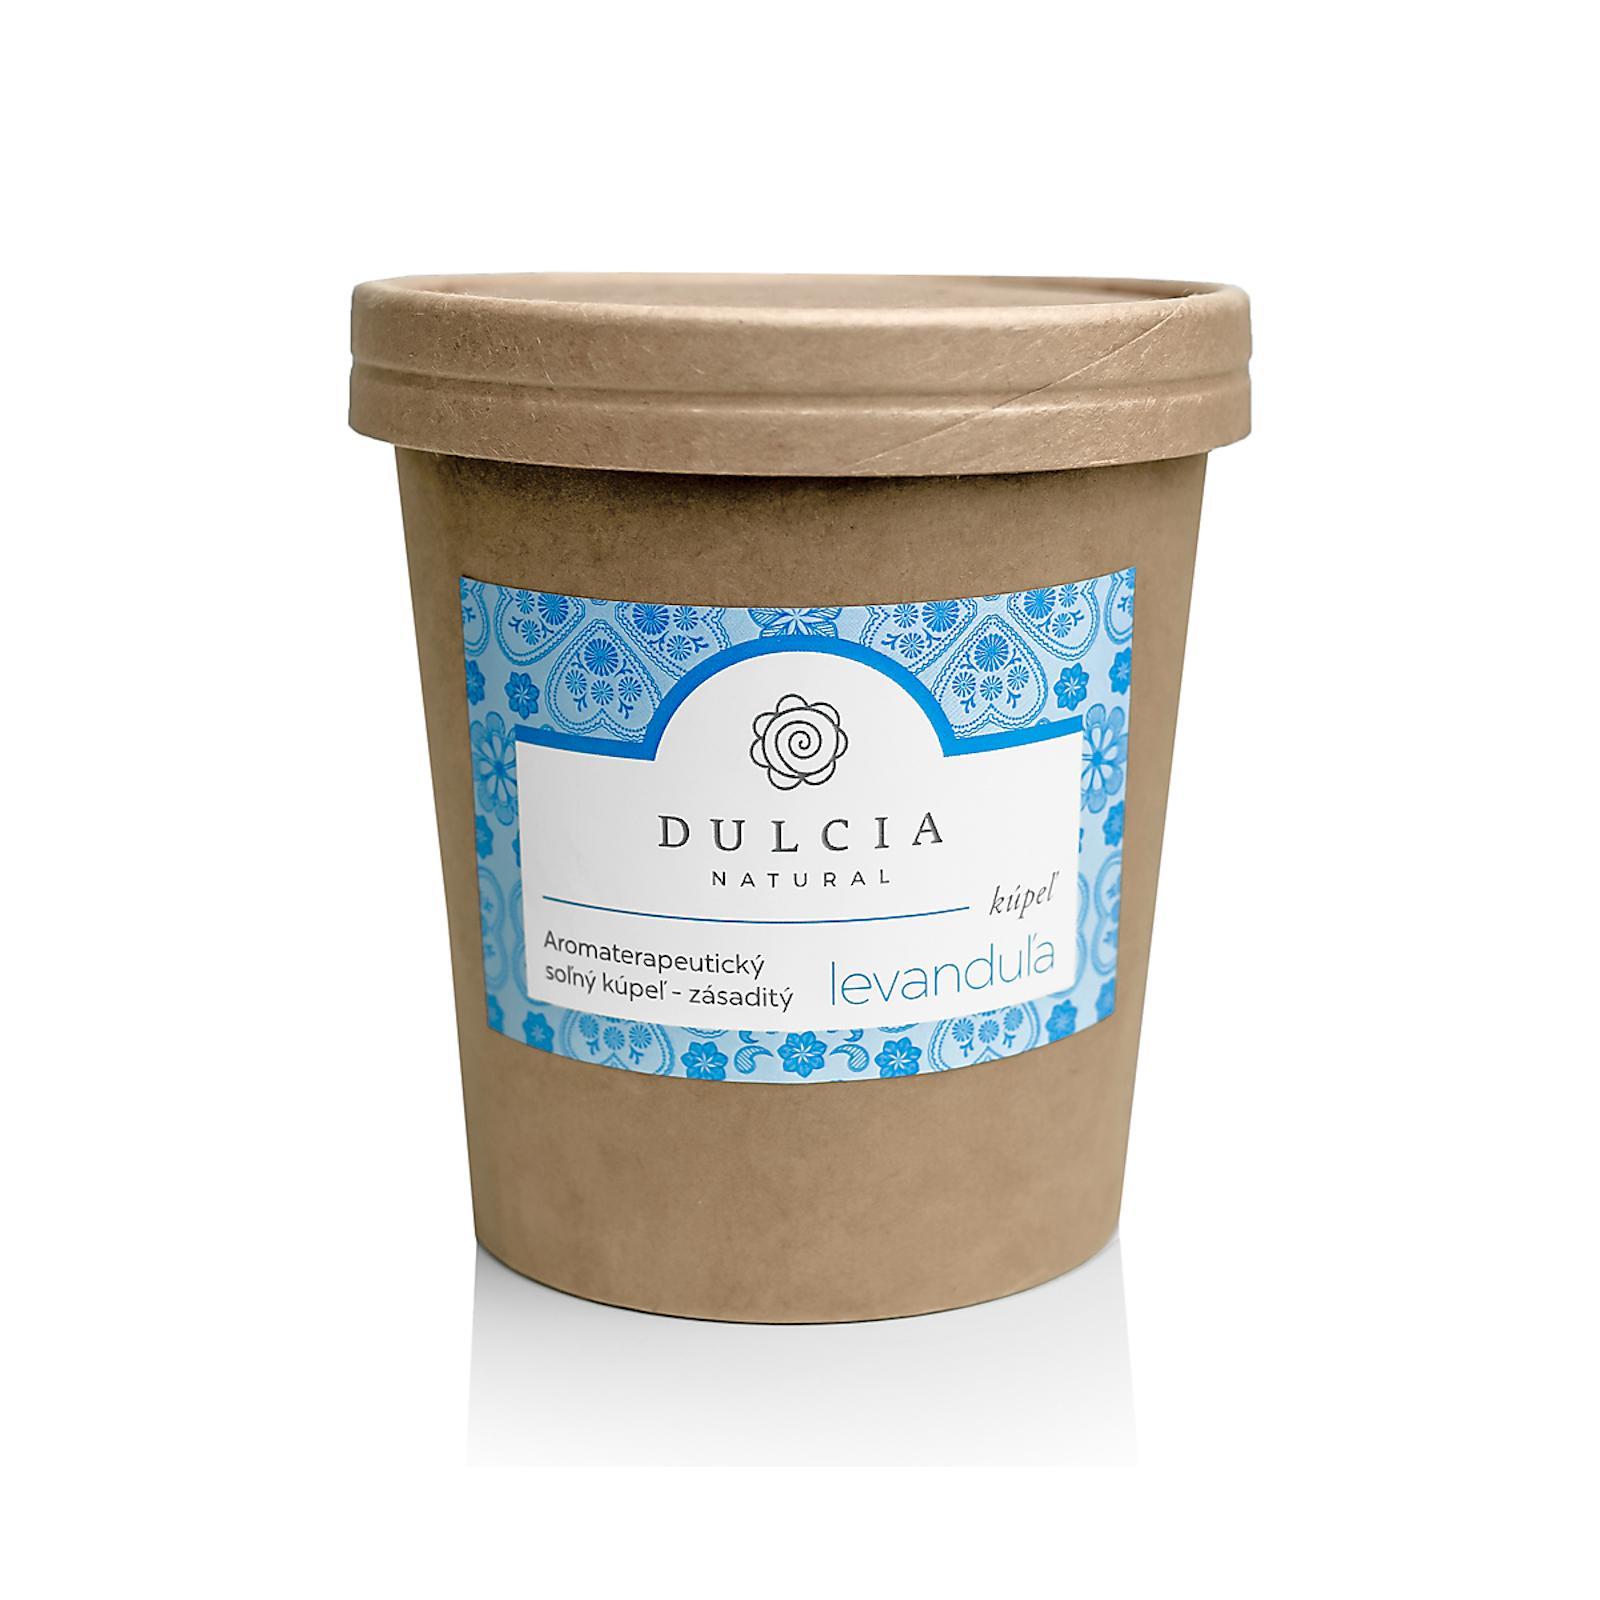 DULCIA natural Aromaterapeutická solná koupel levandule 550 g